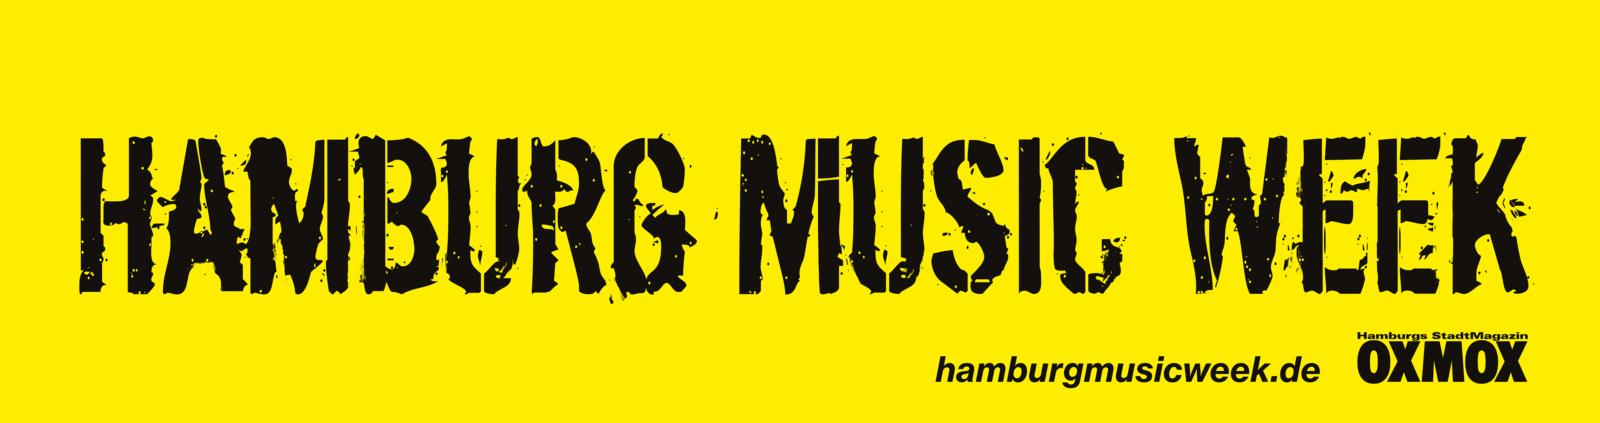 hamburg-music-week-logo